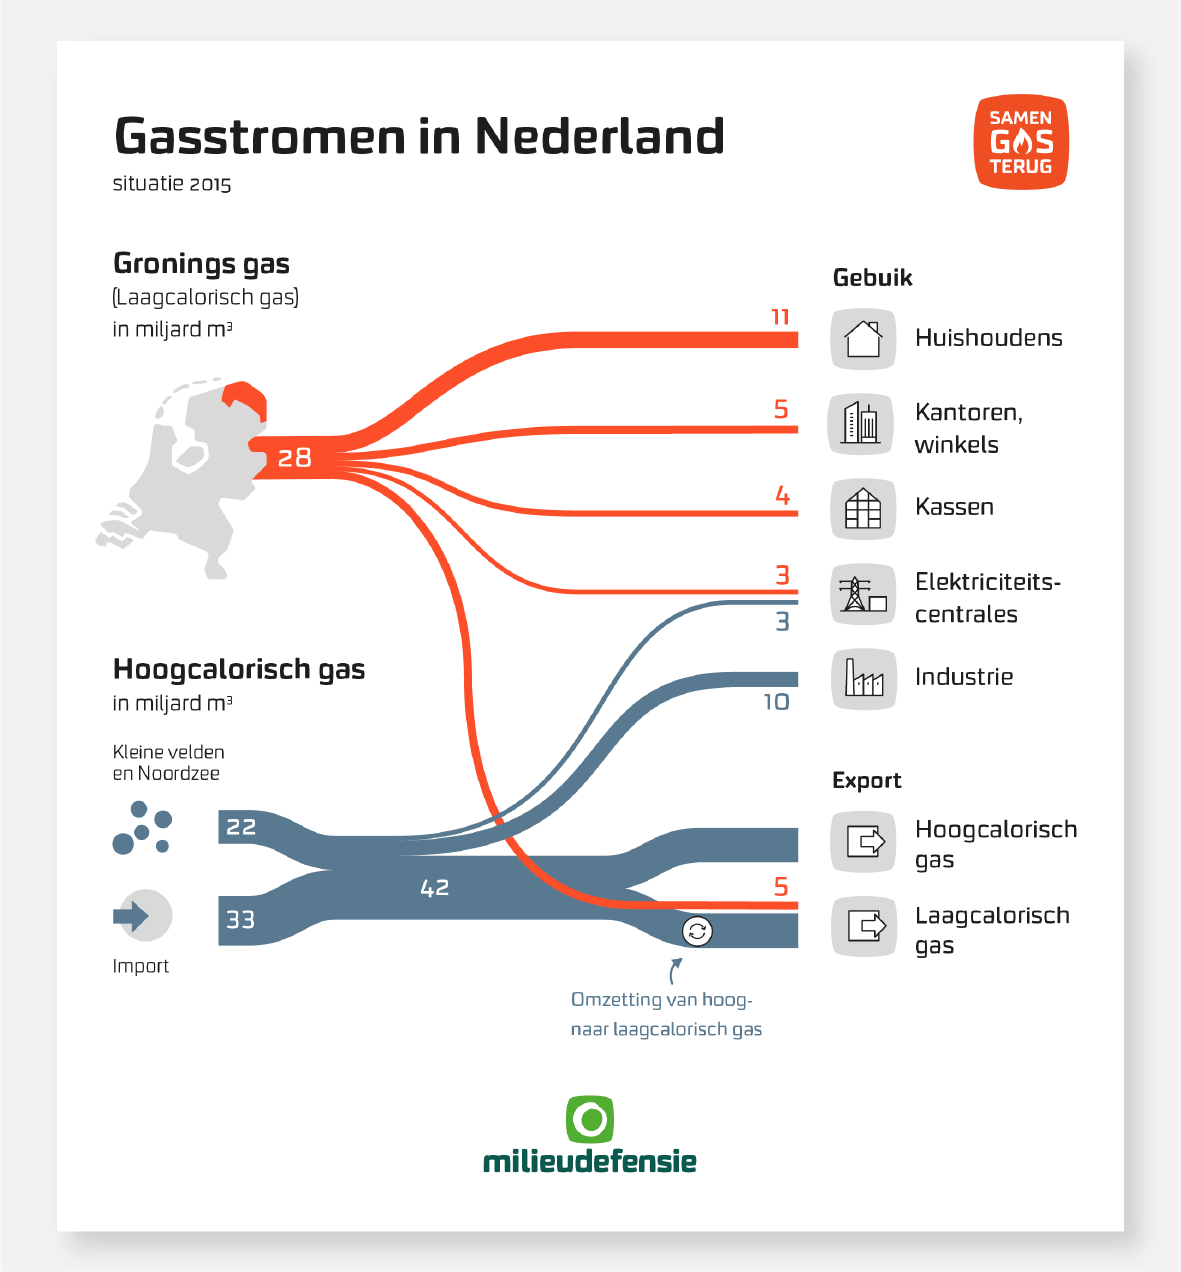 009-samen-gas-terug-infographic-gasstromen-act-impact